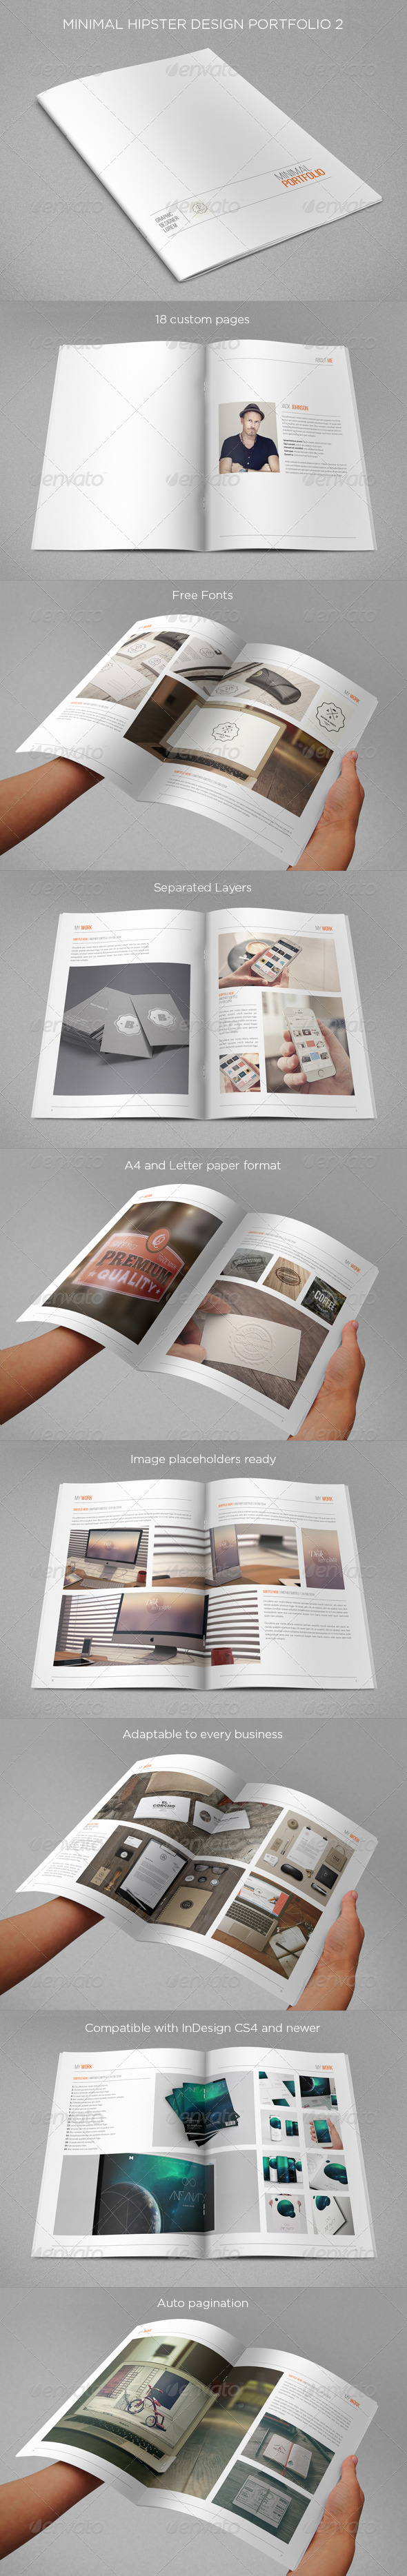 GraphicRiver Minimal Hipster Design Portfolio 2 8408120